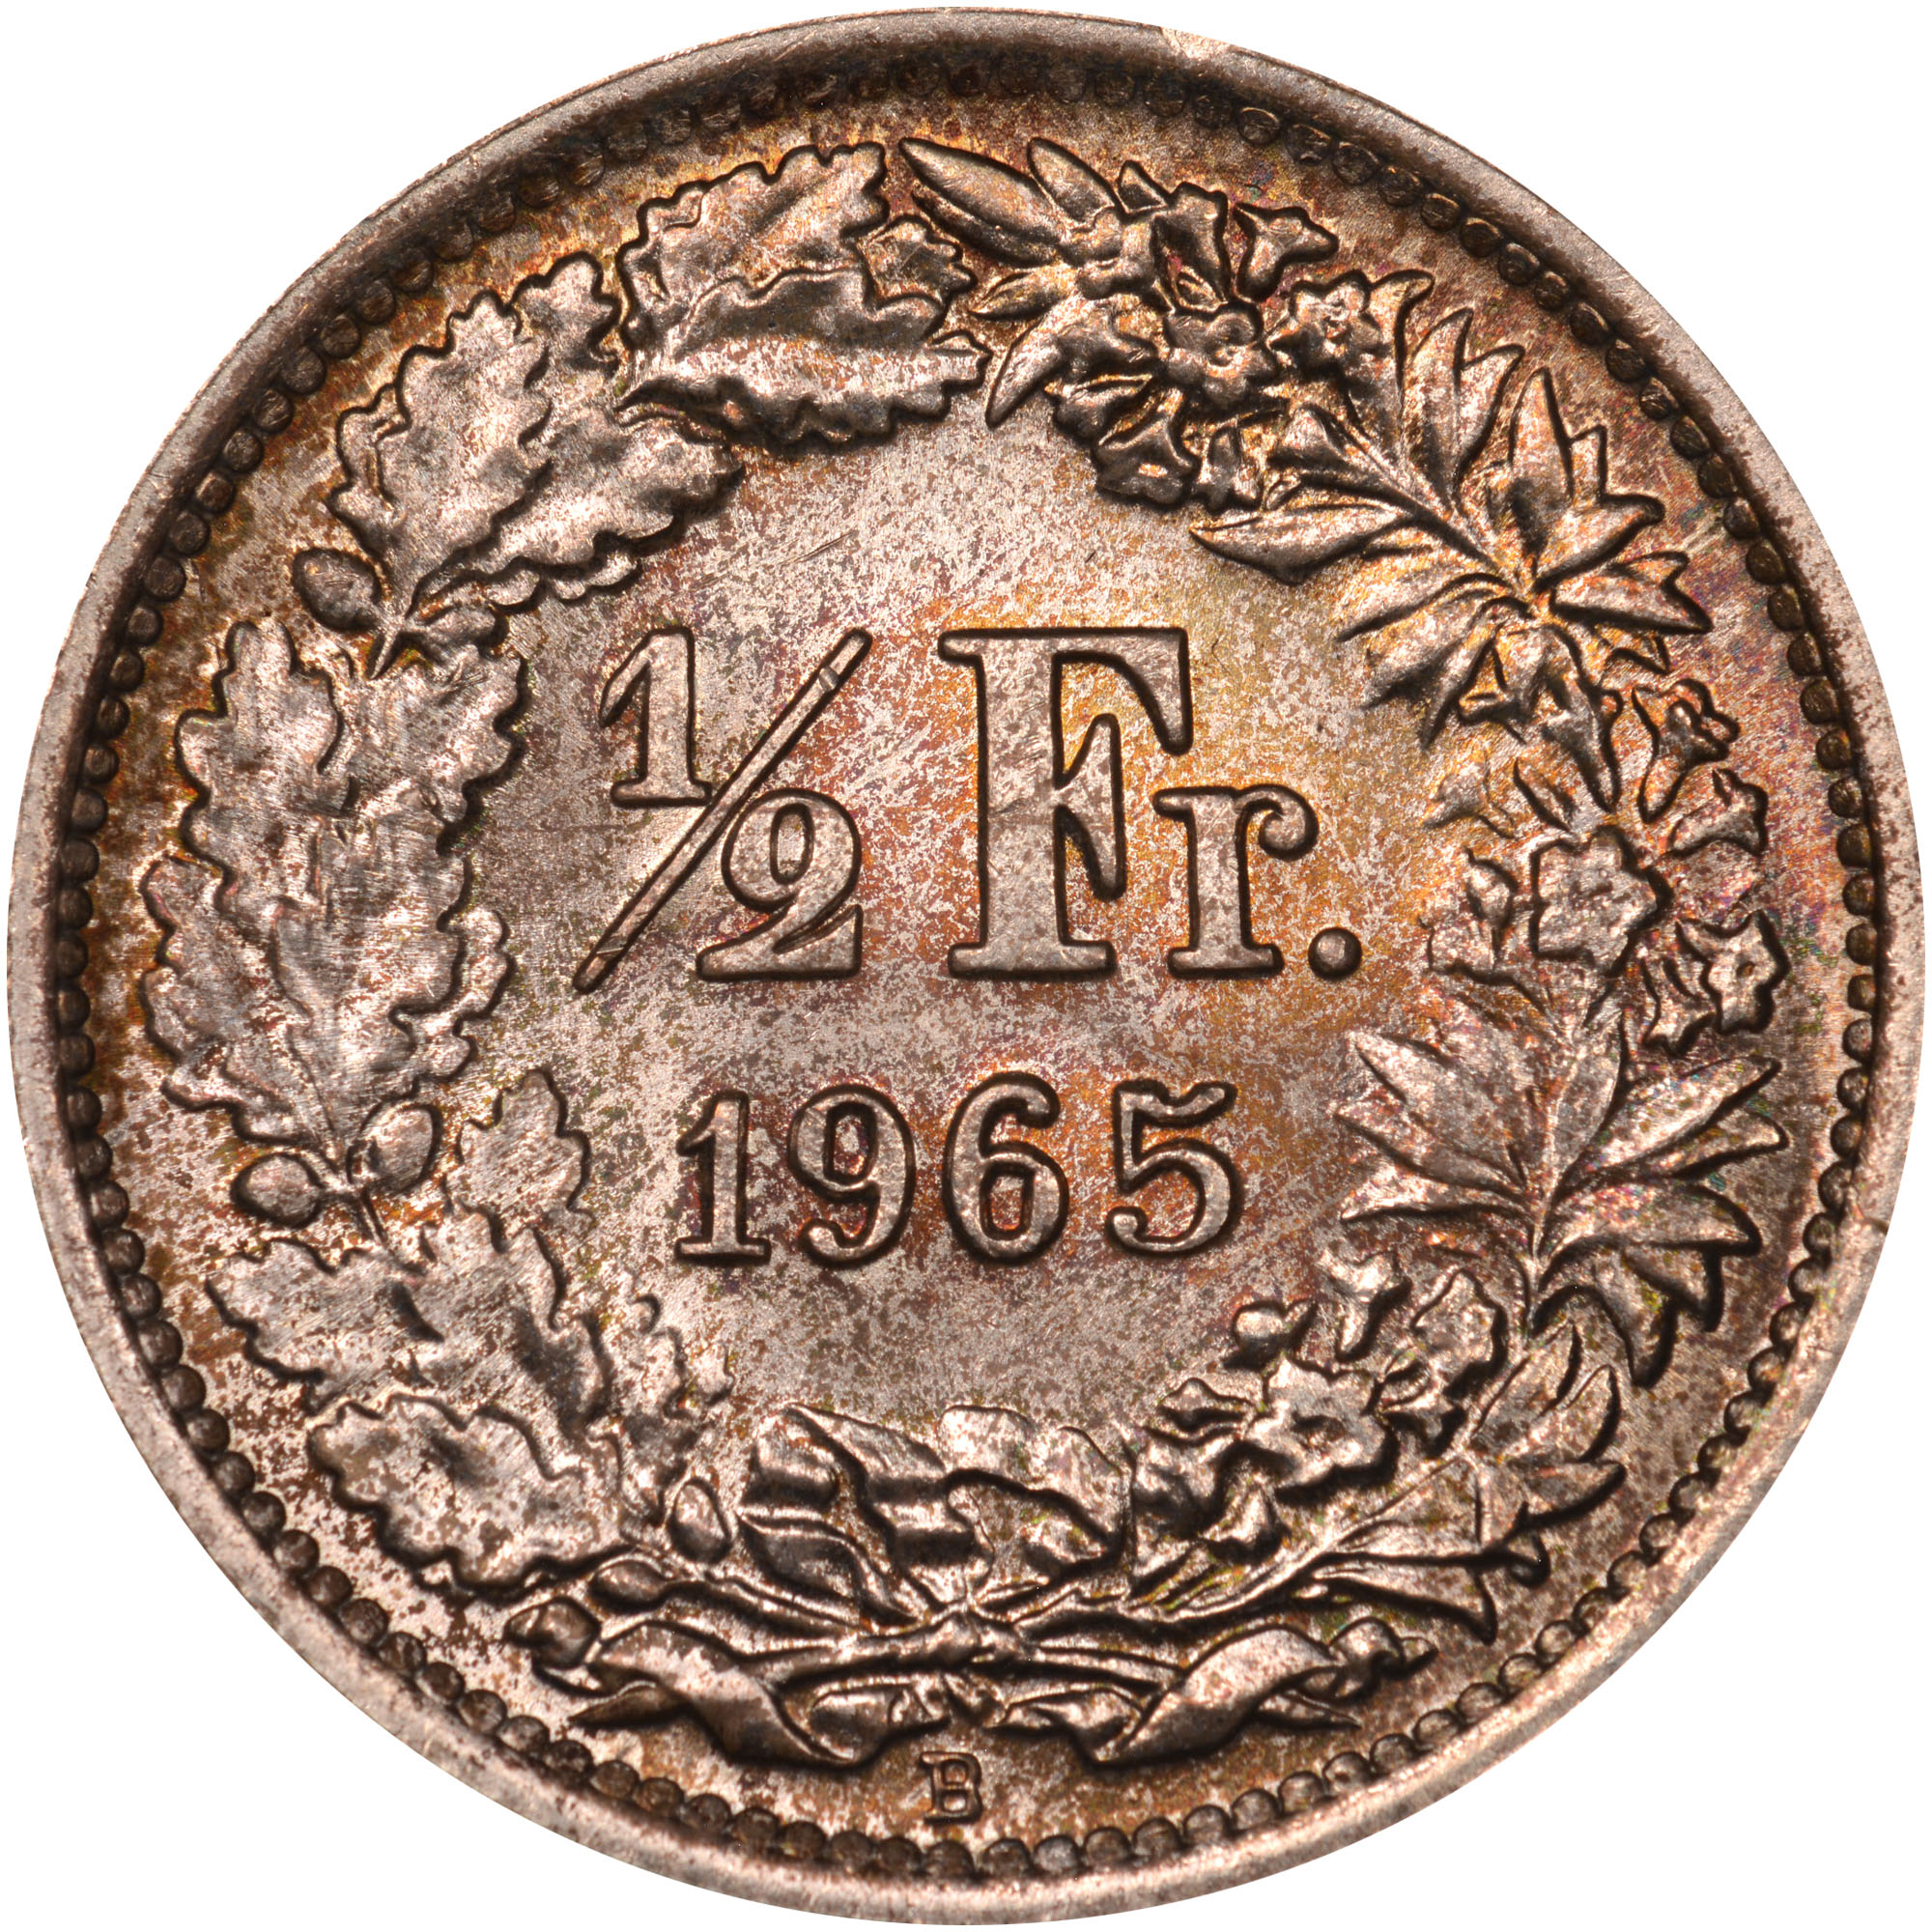 1875-1967 Switzerland 1/2 Franc reverse